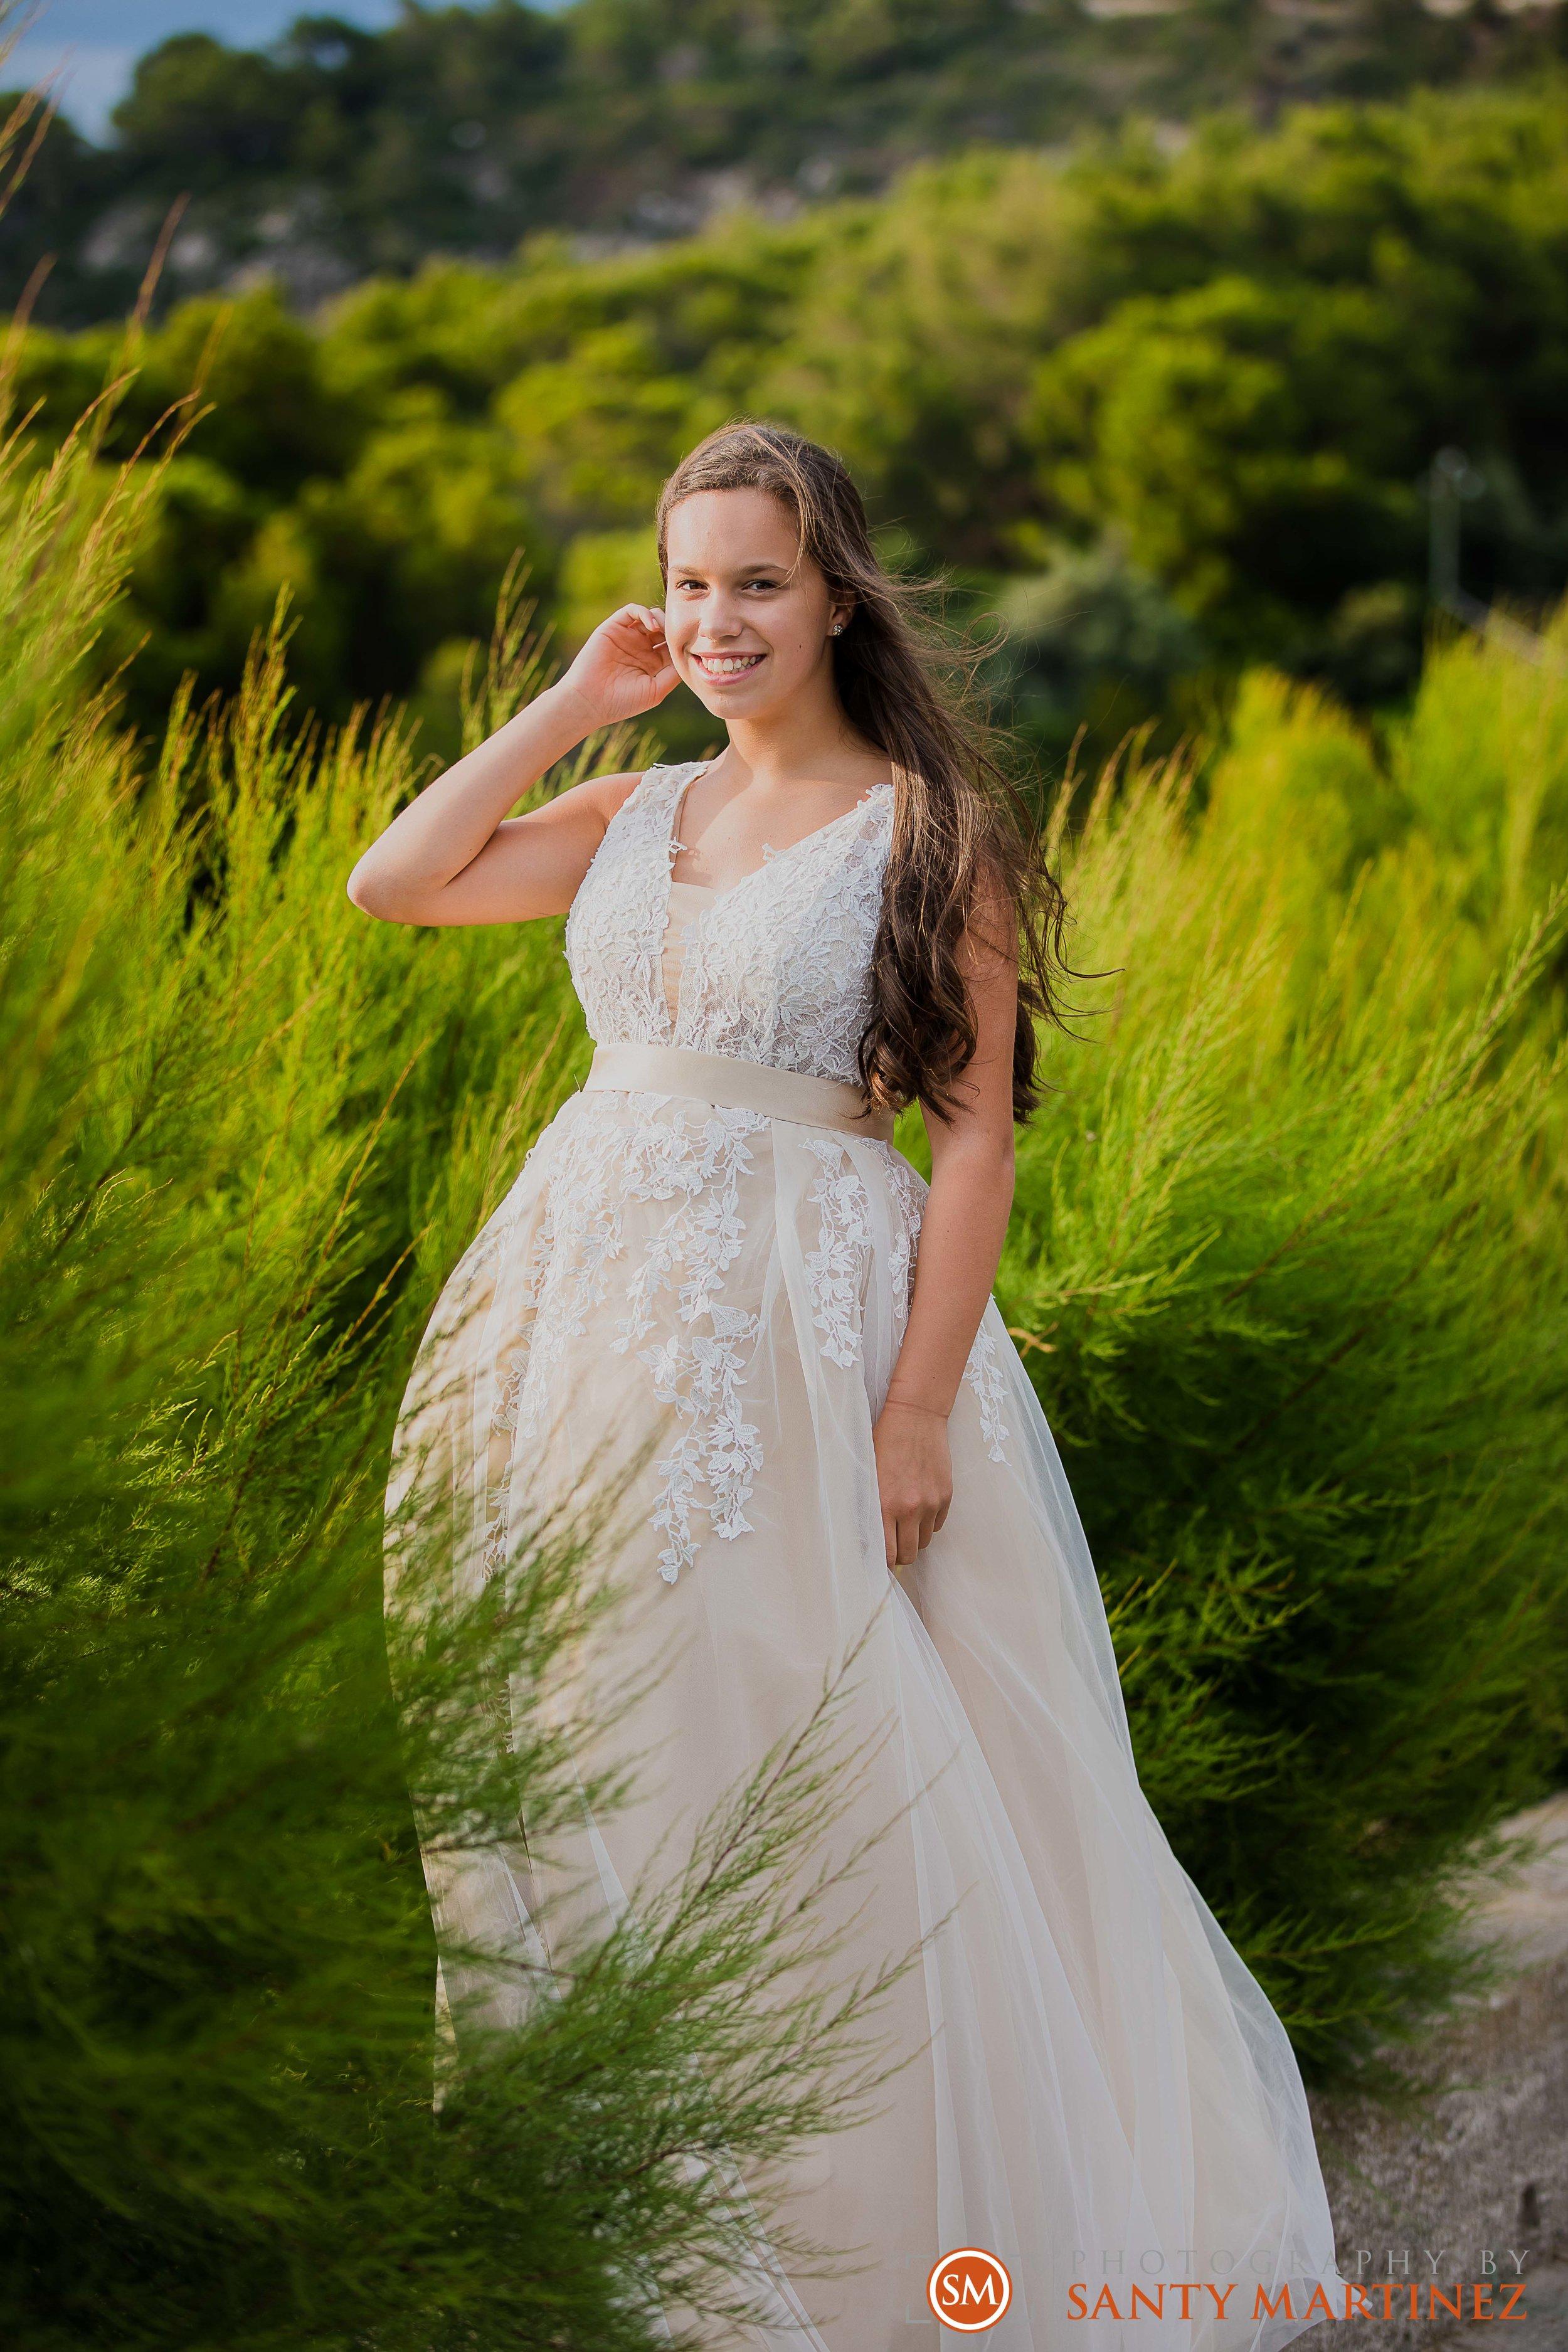 Wedding Capri Italy - Photography by Santy Martinez-38.jpg